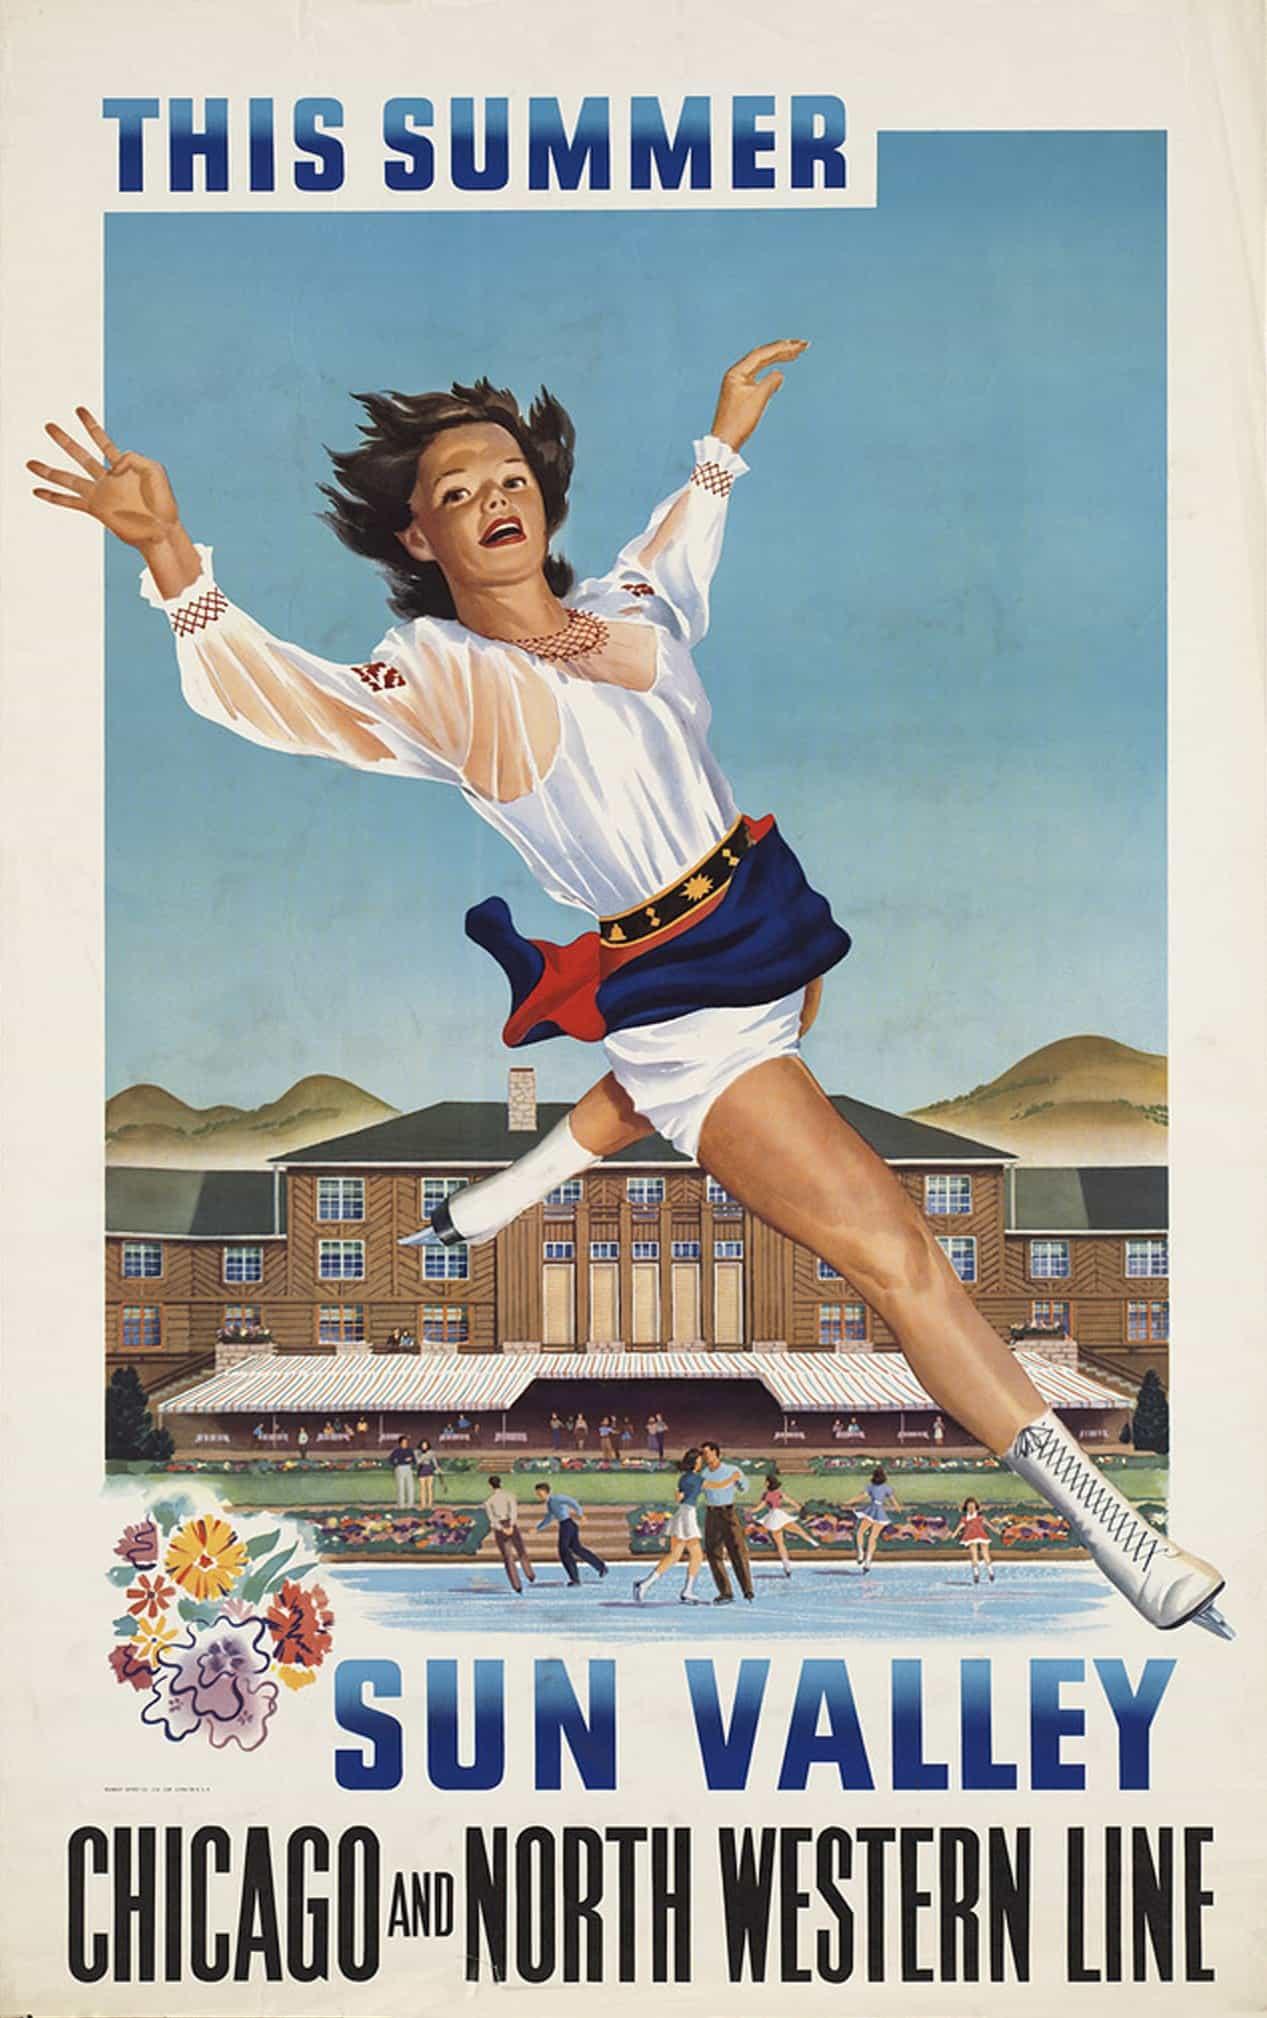 Los Angeles Olympic Games Vintage Poster - Los angeles posters vintage